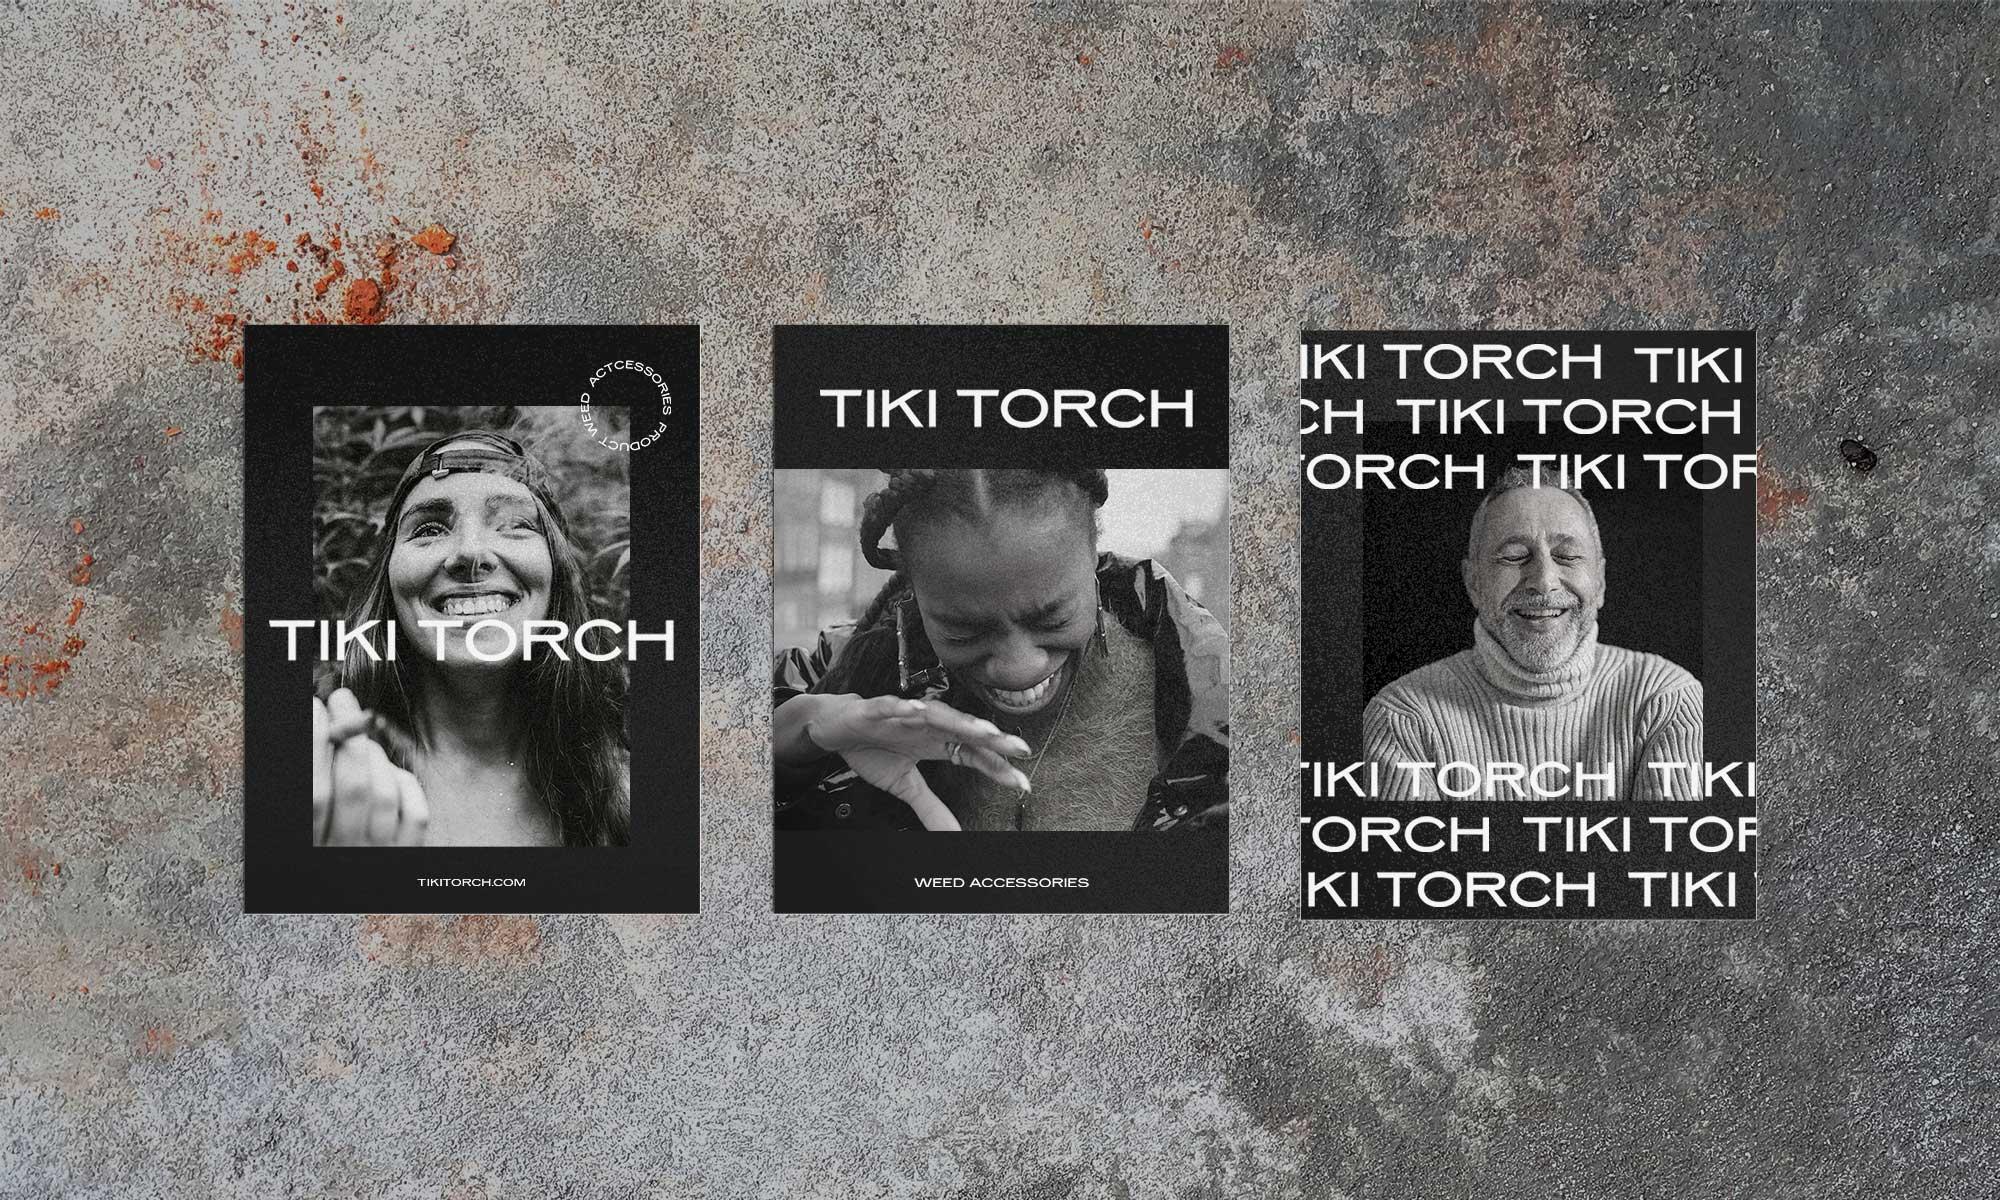 191205-tikitorch-branding-posters-3